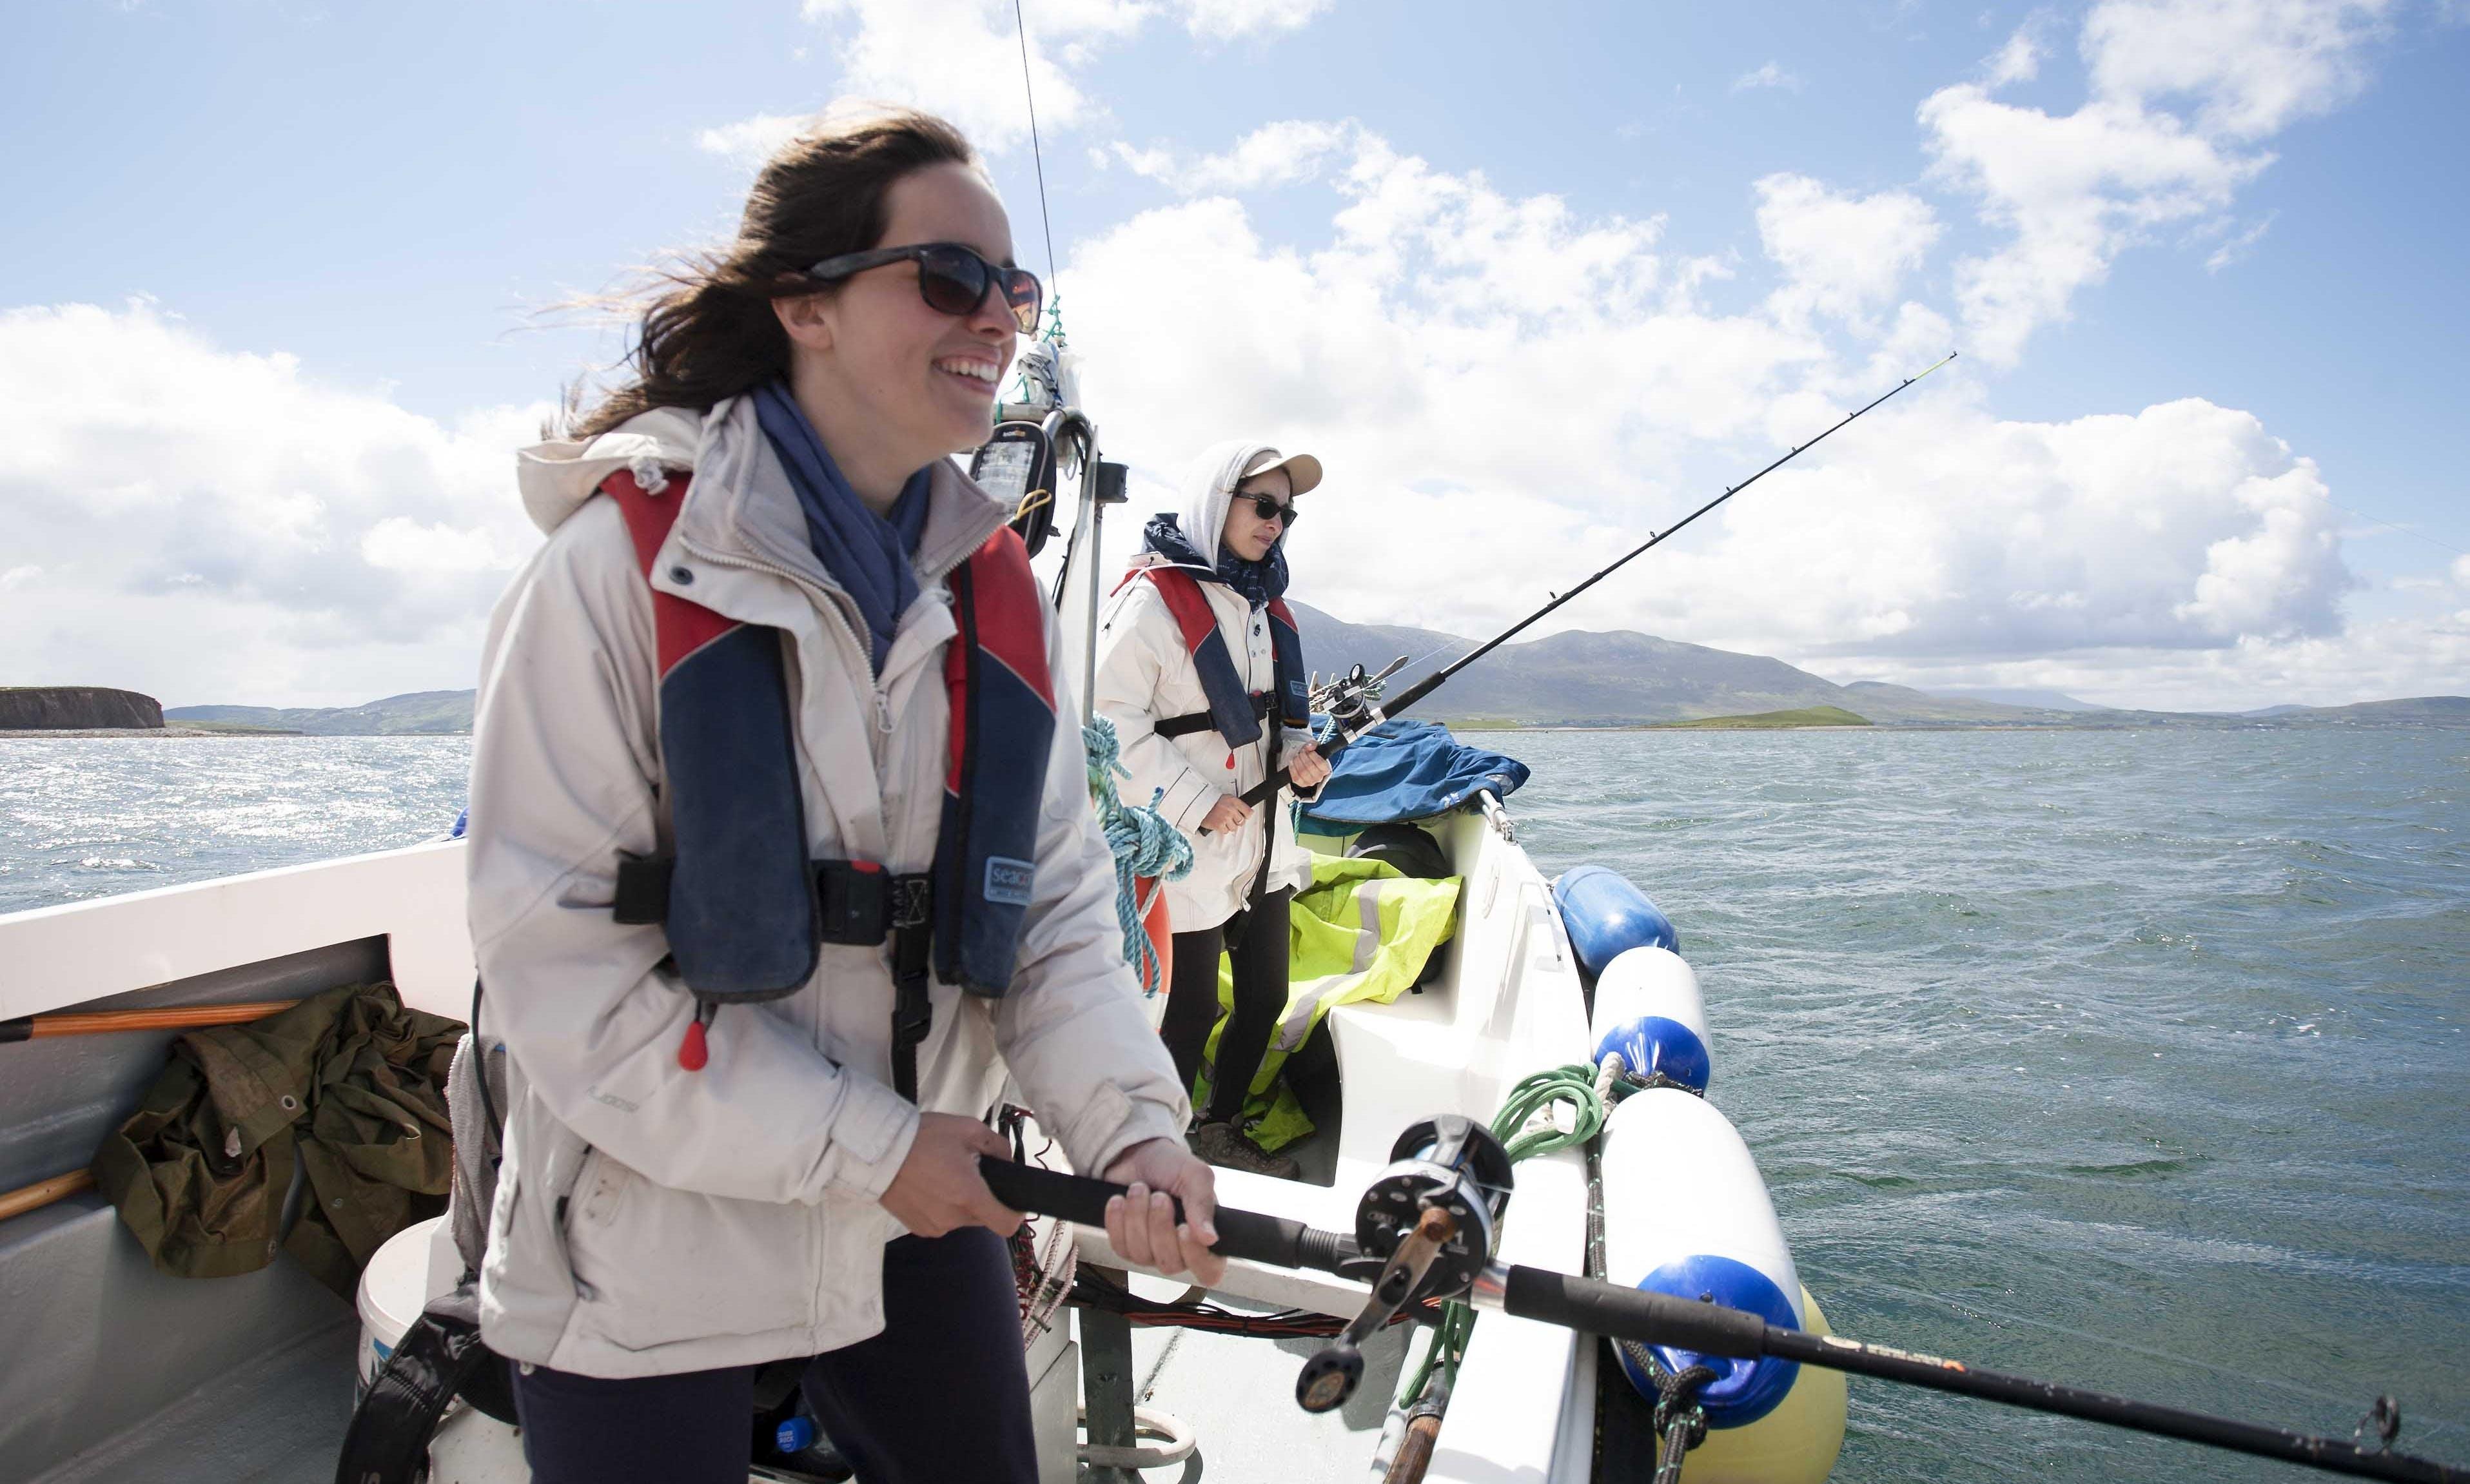 Explore Clew Bay islands archipelago from Rosmoney Pier